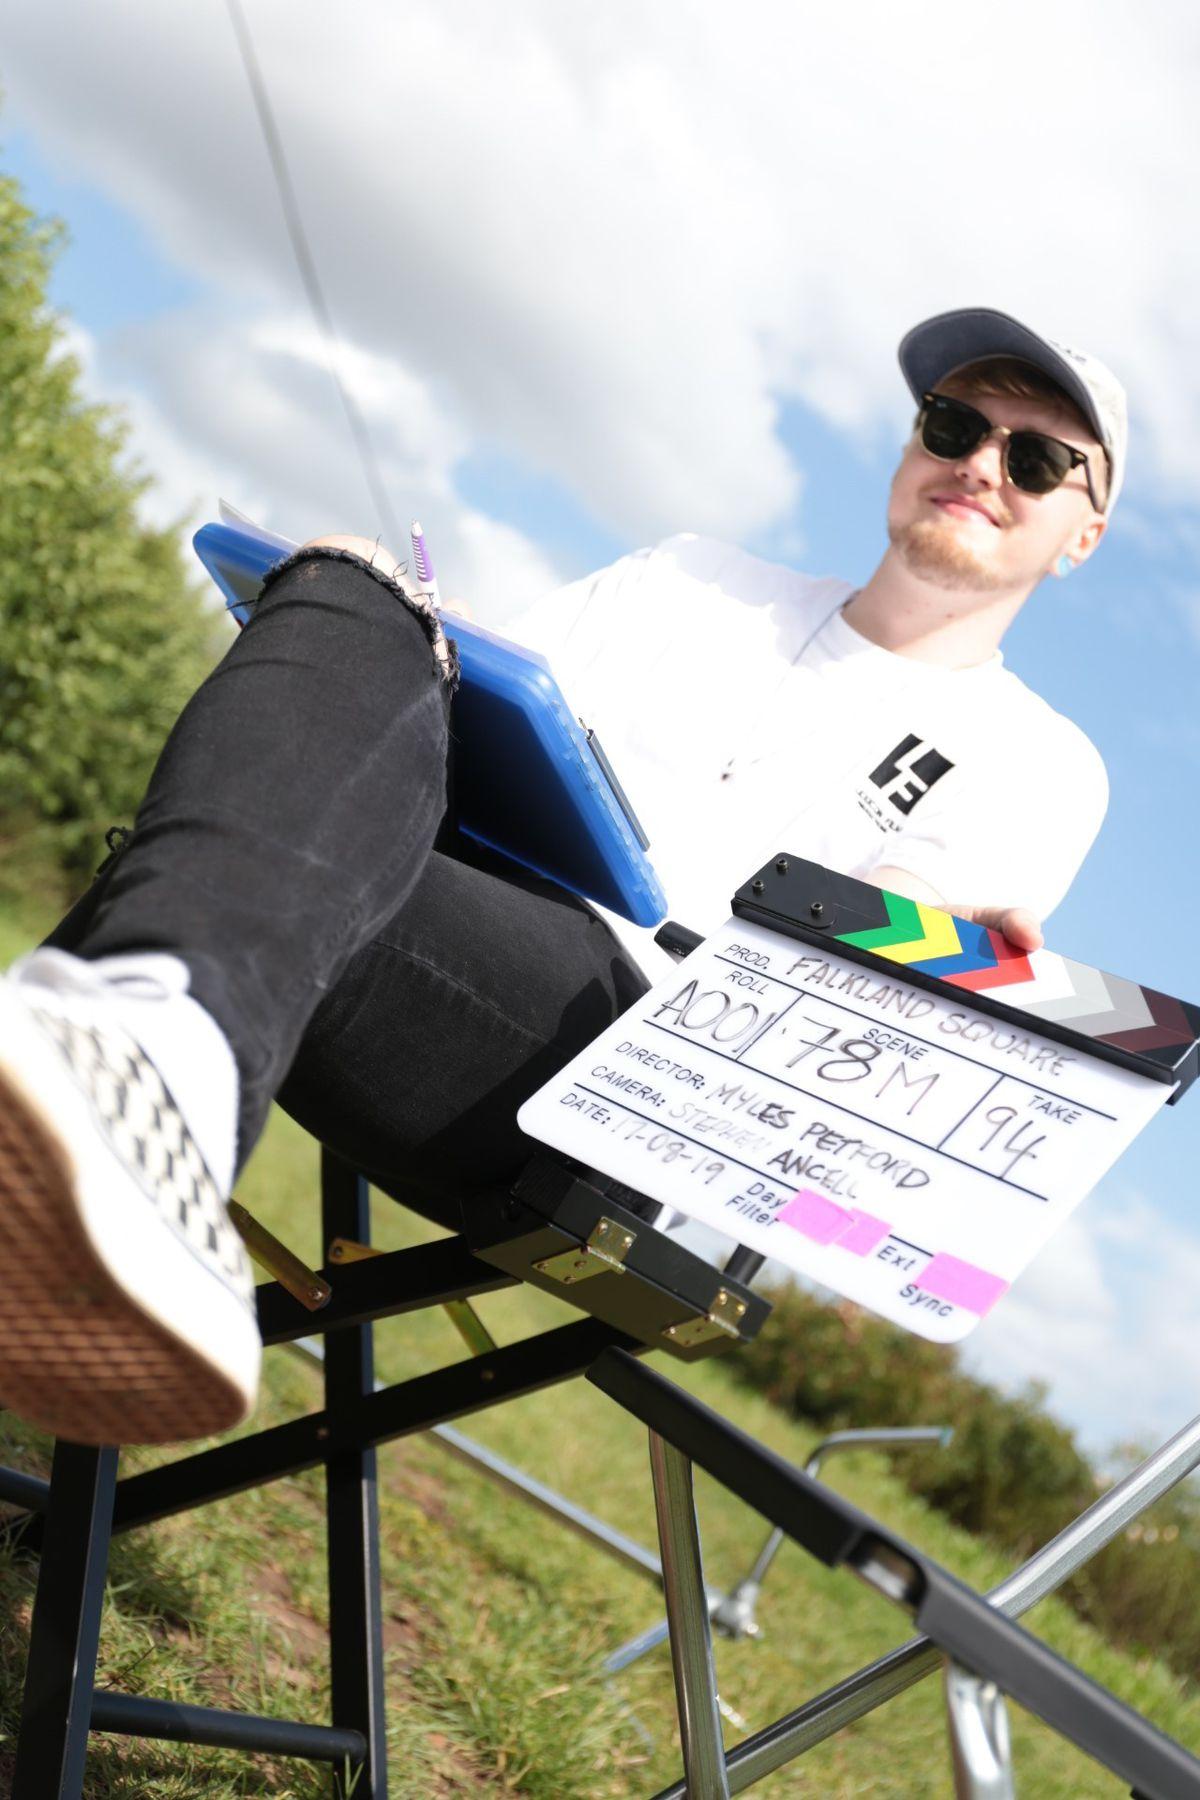 Myles Petford, from Bridgnorth, director of Falklands Square film